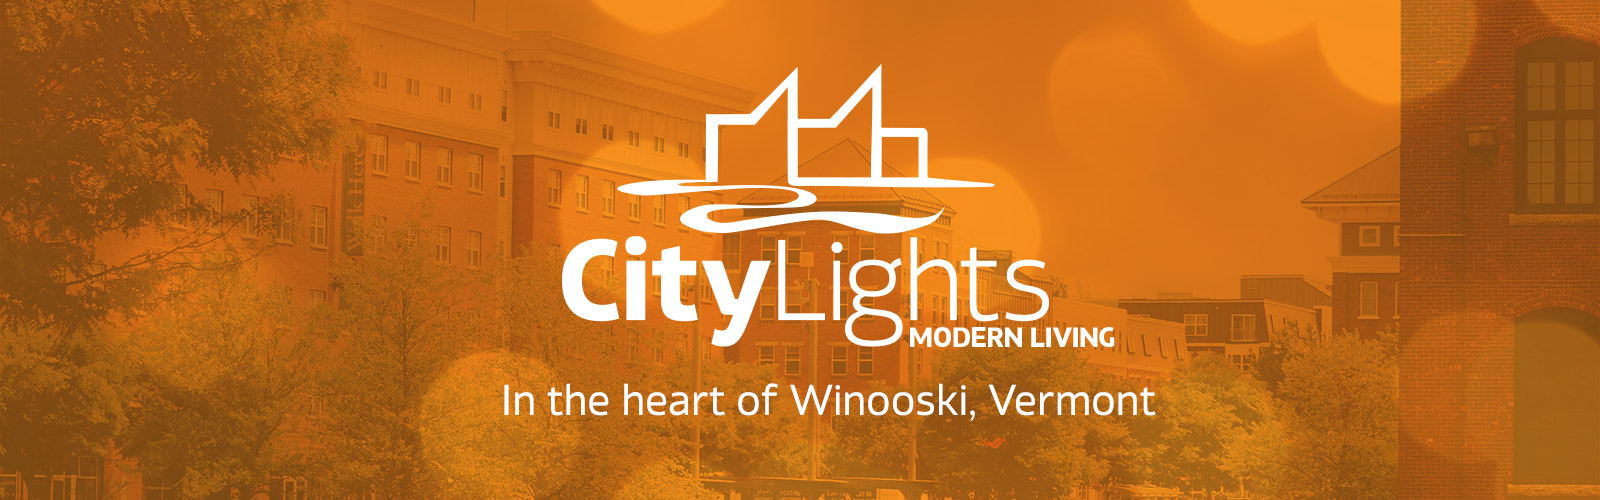 CityLights Winooski VT